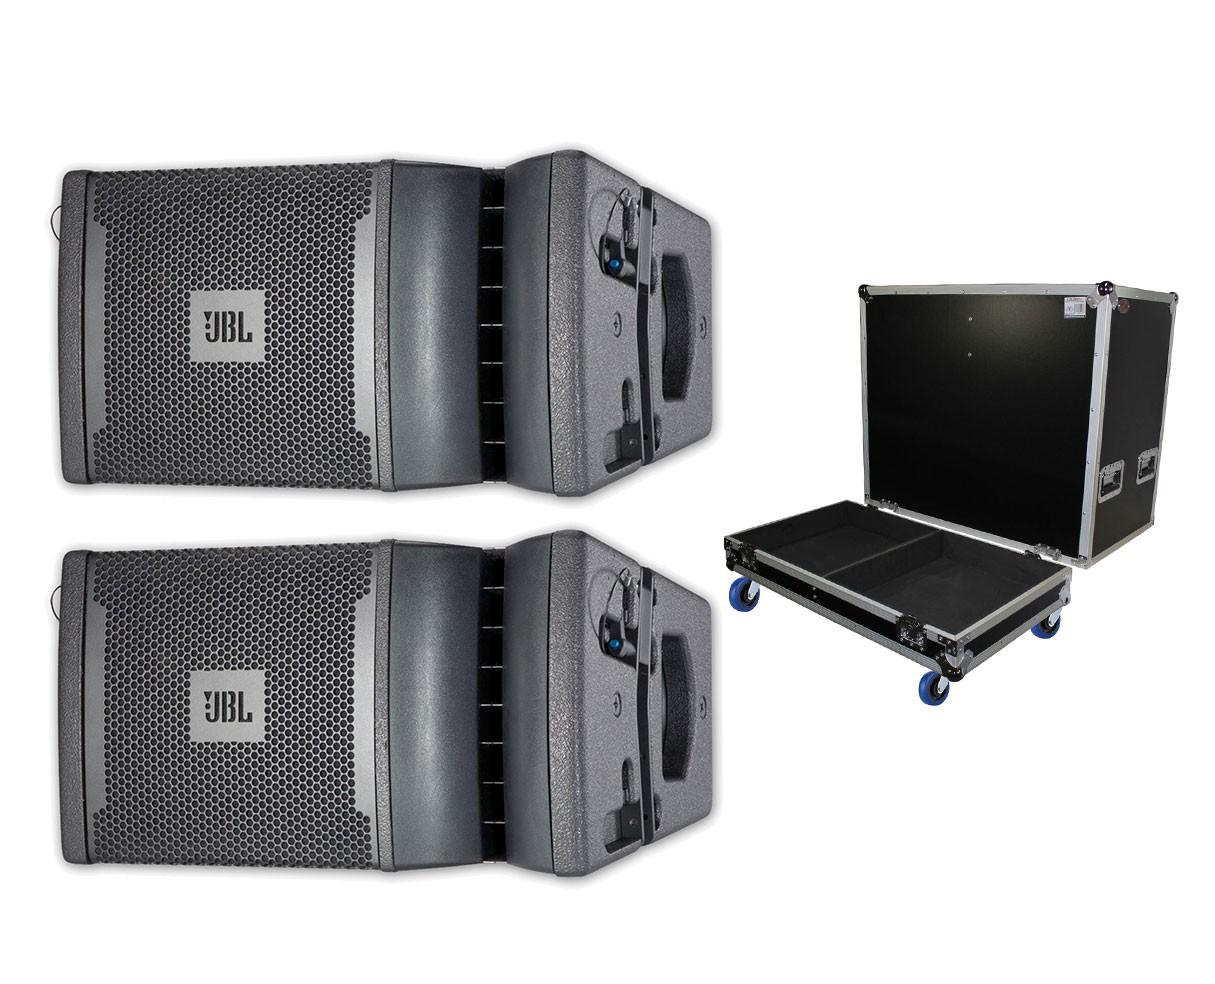 2x JBL VRX932LAP + ATA Case